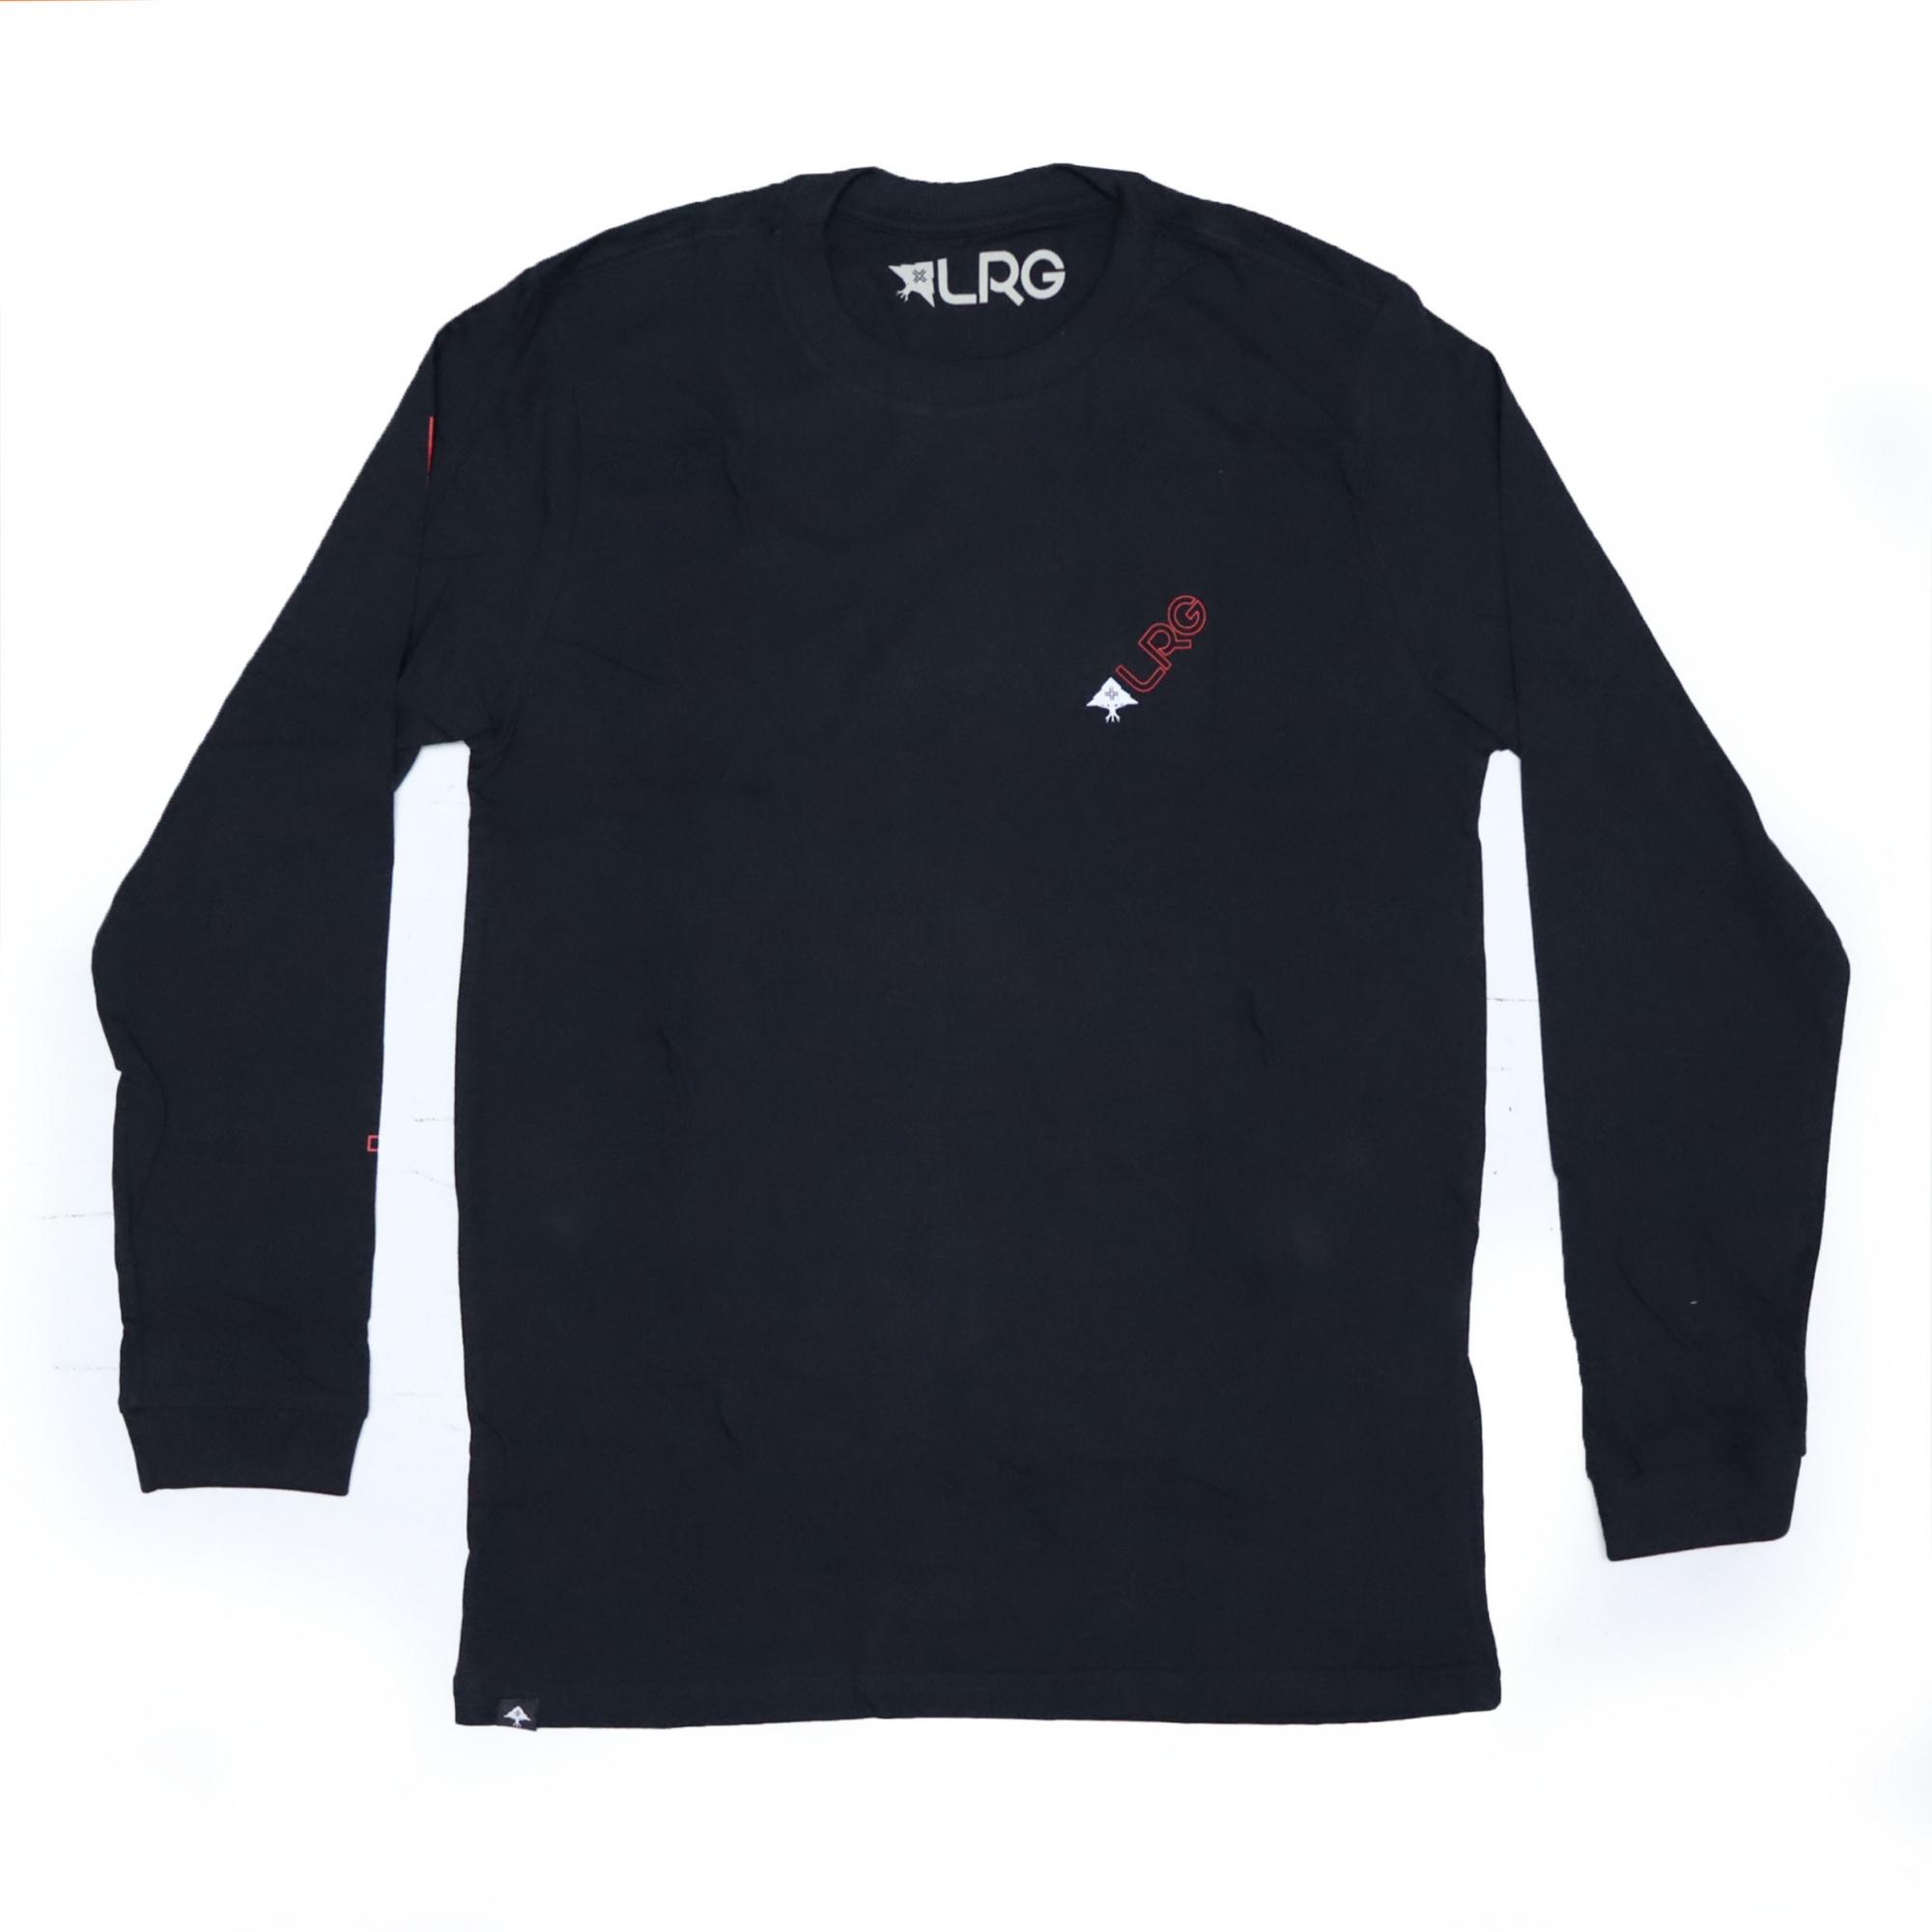 Camiseta Manga Longa LRG Slant - Preto